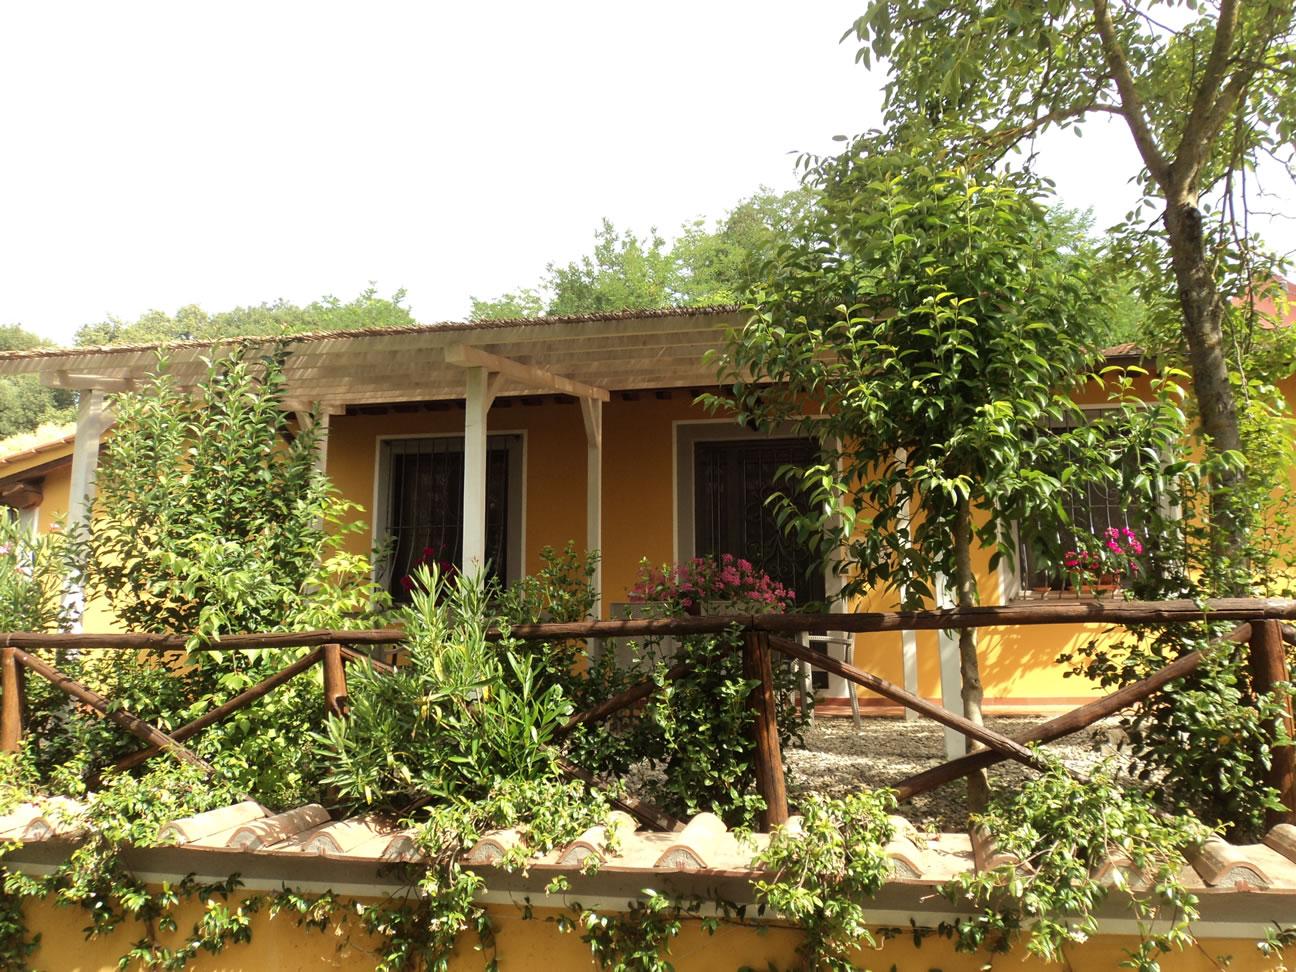 Villa-Giotto-Cimabue-esterno-vista-parco-e-piscina